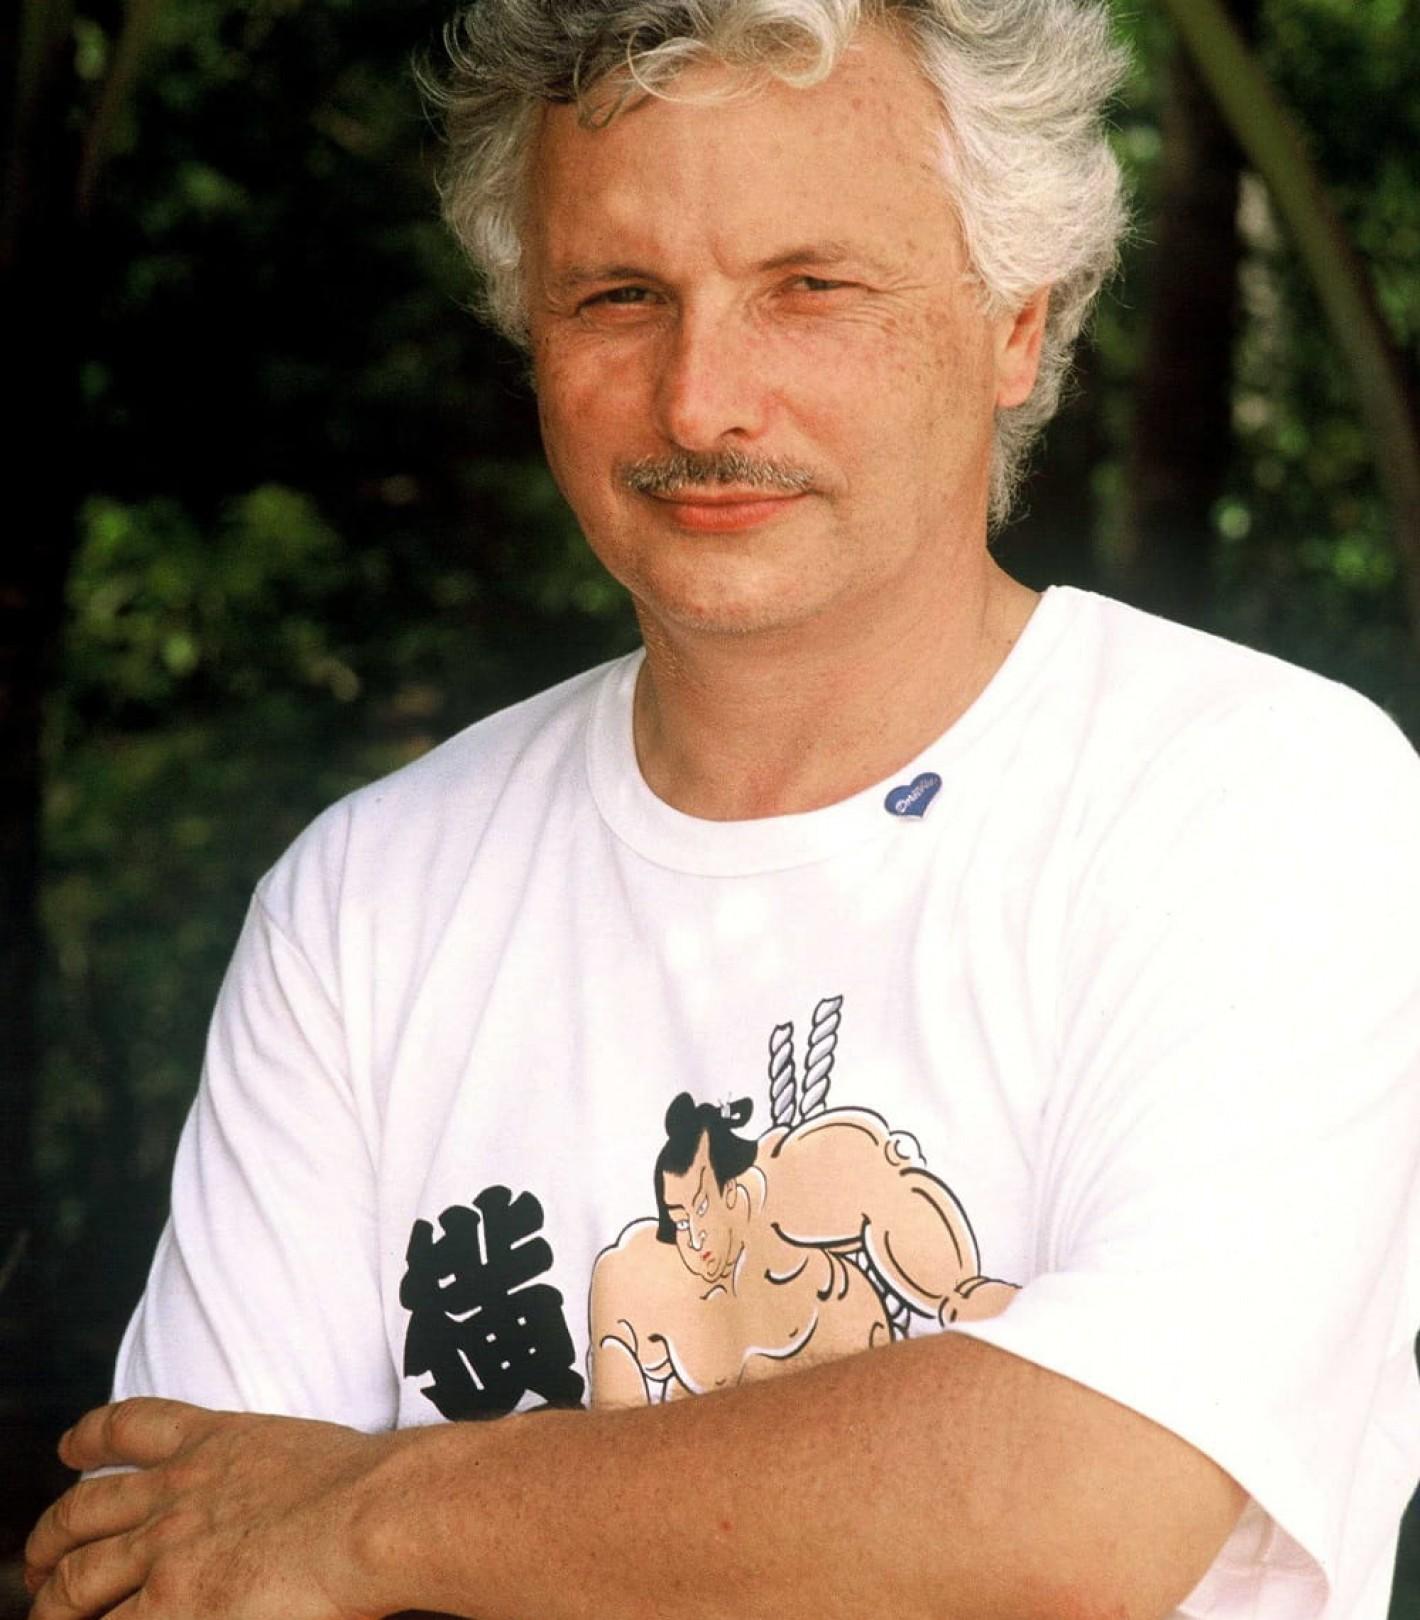 Baptiste Klein